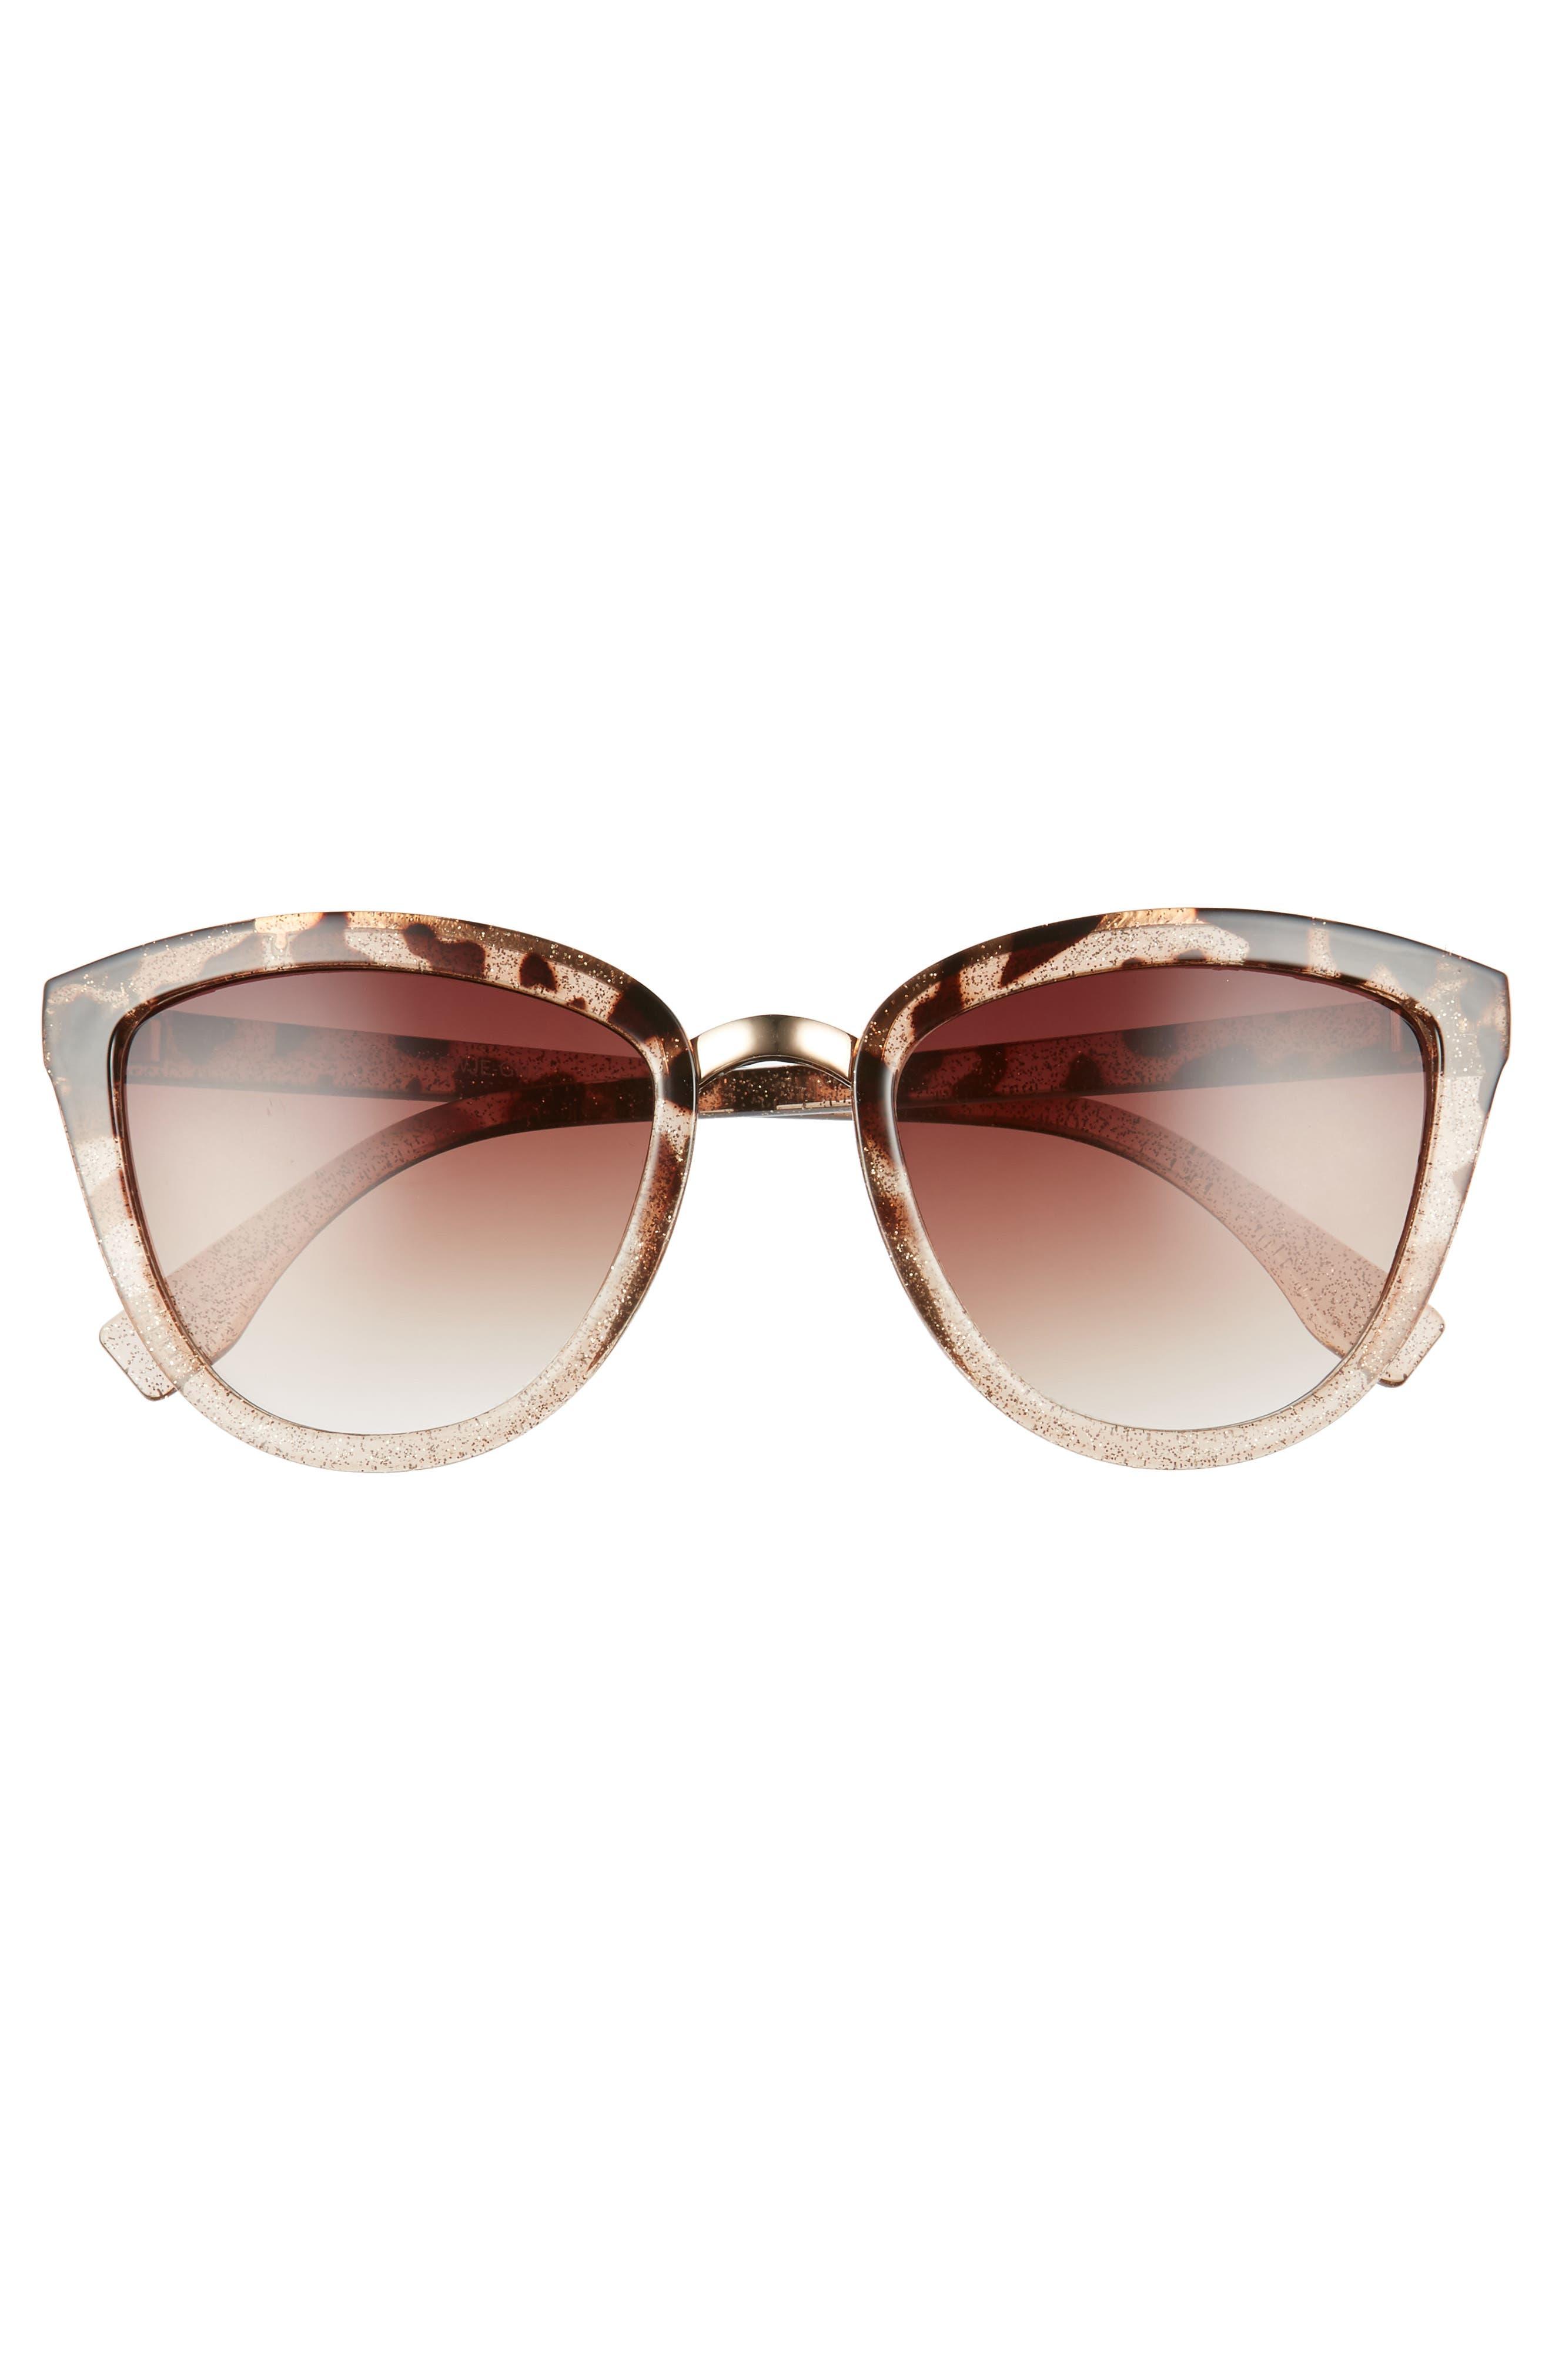 54mm Sparkle Cat Eye Sunglasses,                             Alternate thumbnail 3, color,                             Tort